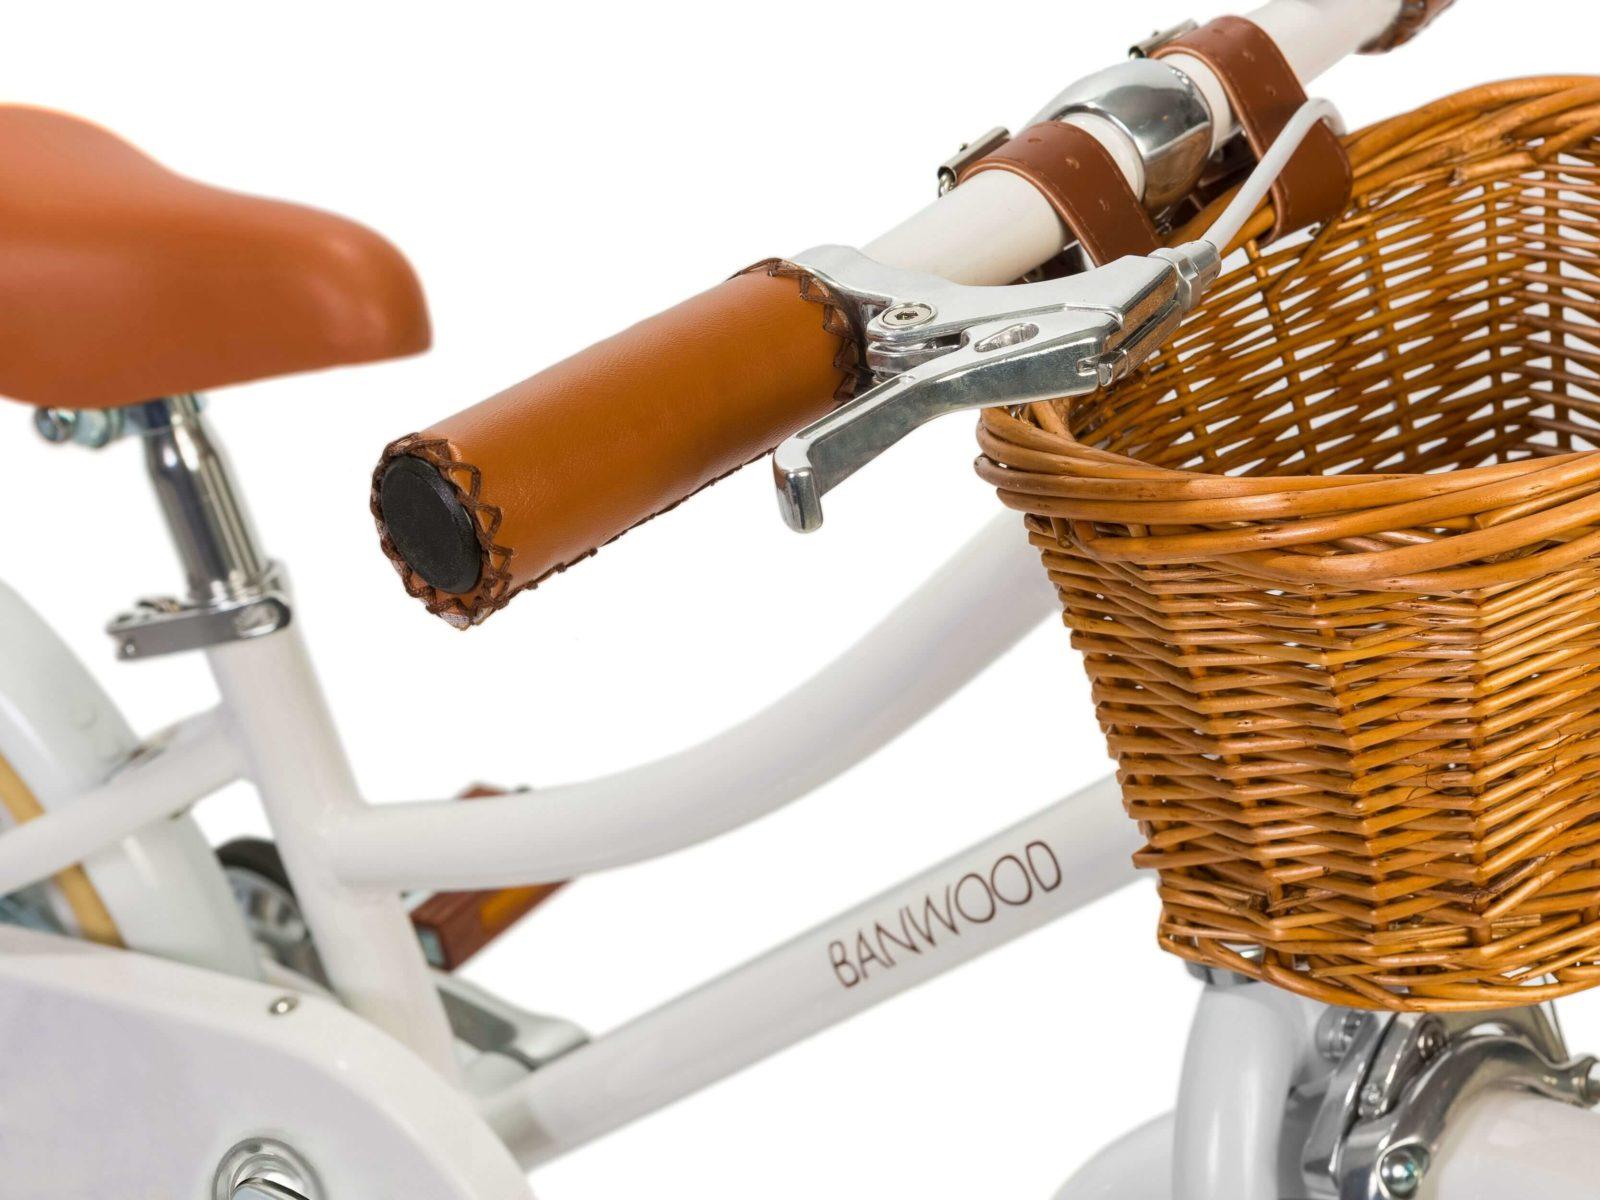 banwood 16 zoll retro kinder fahrrad classic white wei. Black Bedroom Furniture Sets. Home Design Ideas